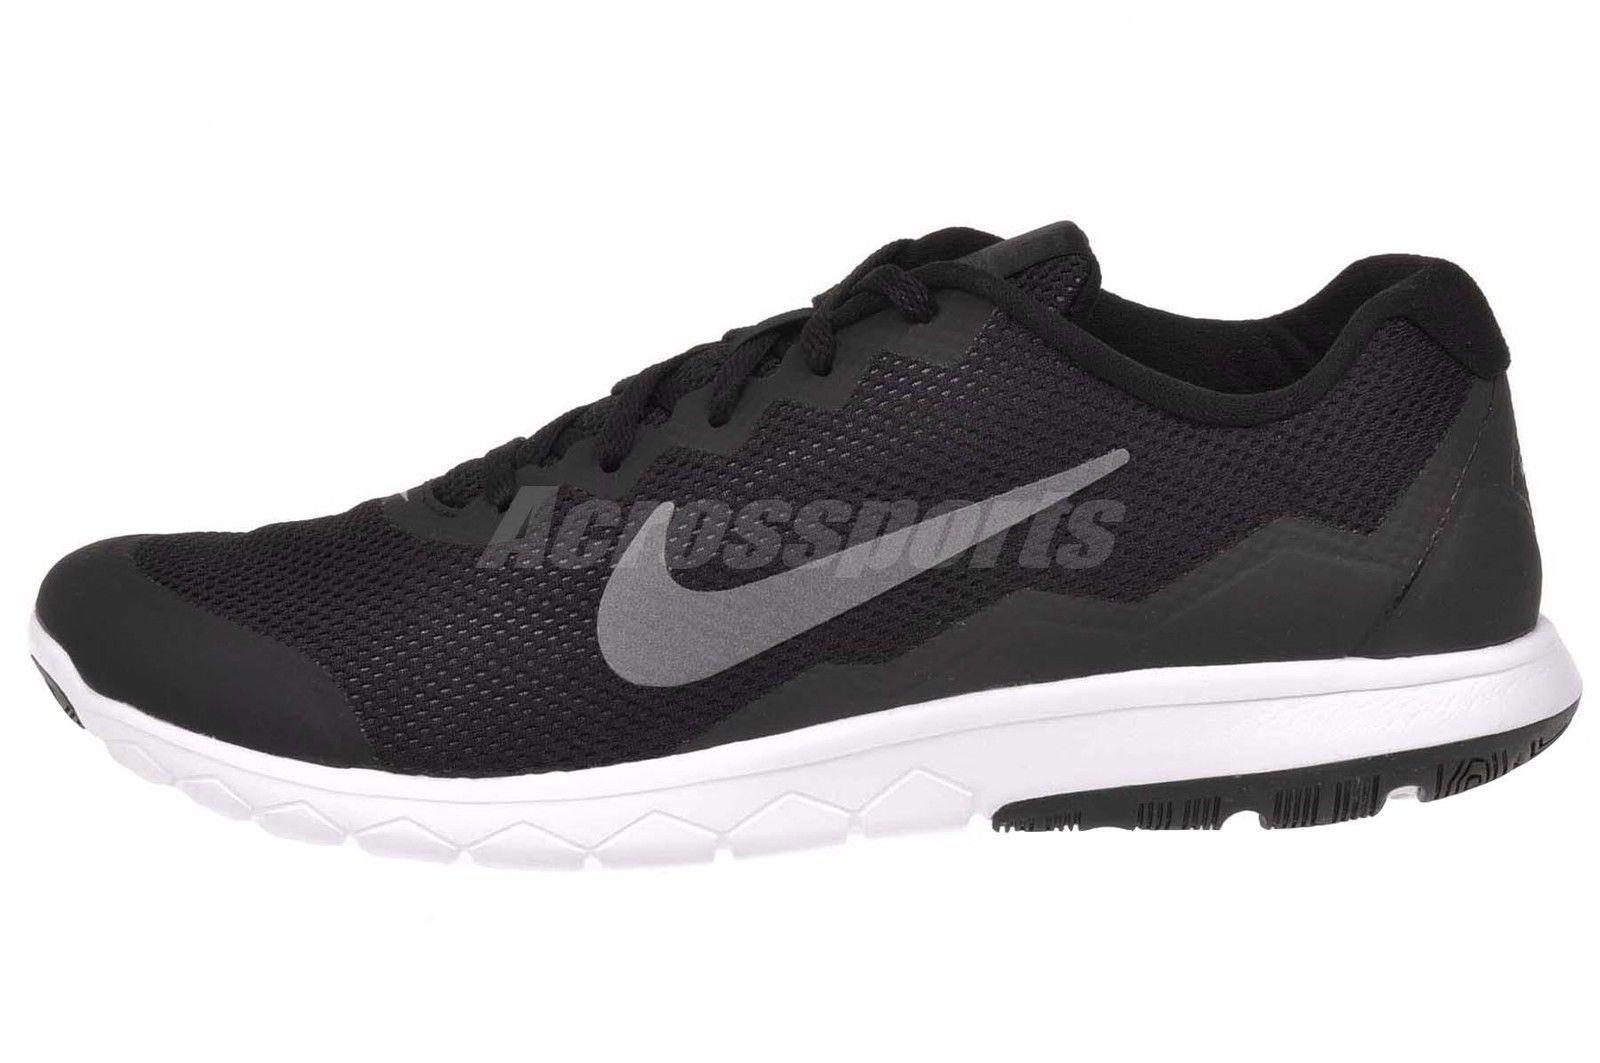 Nike Flex Experience Rn 4 Mens 749172 001: